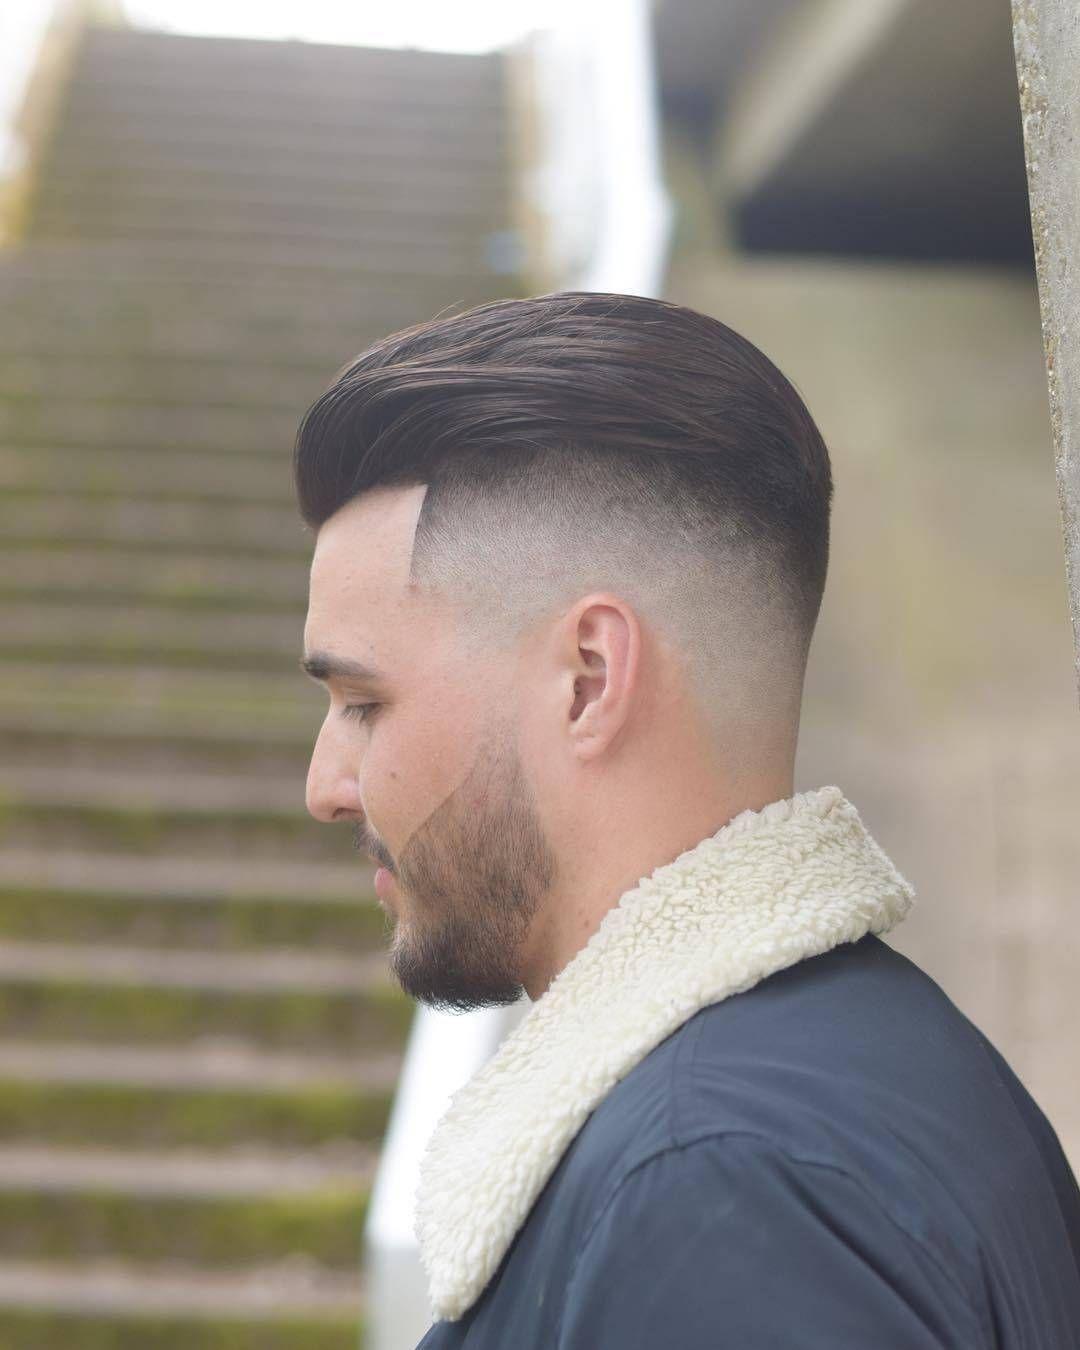 Mens Hairstyles 2017 One Love Barberslick Back Skin Fade Undercut